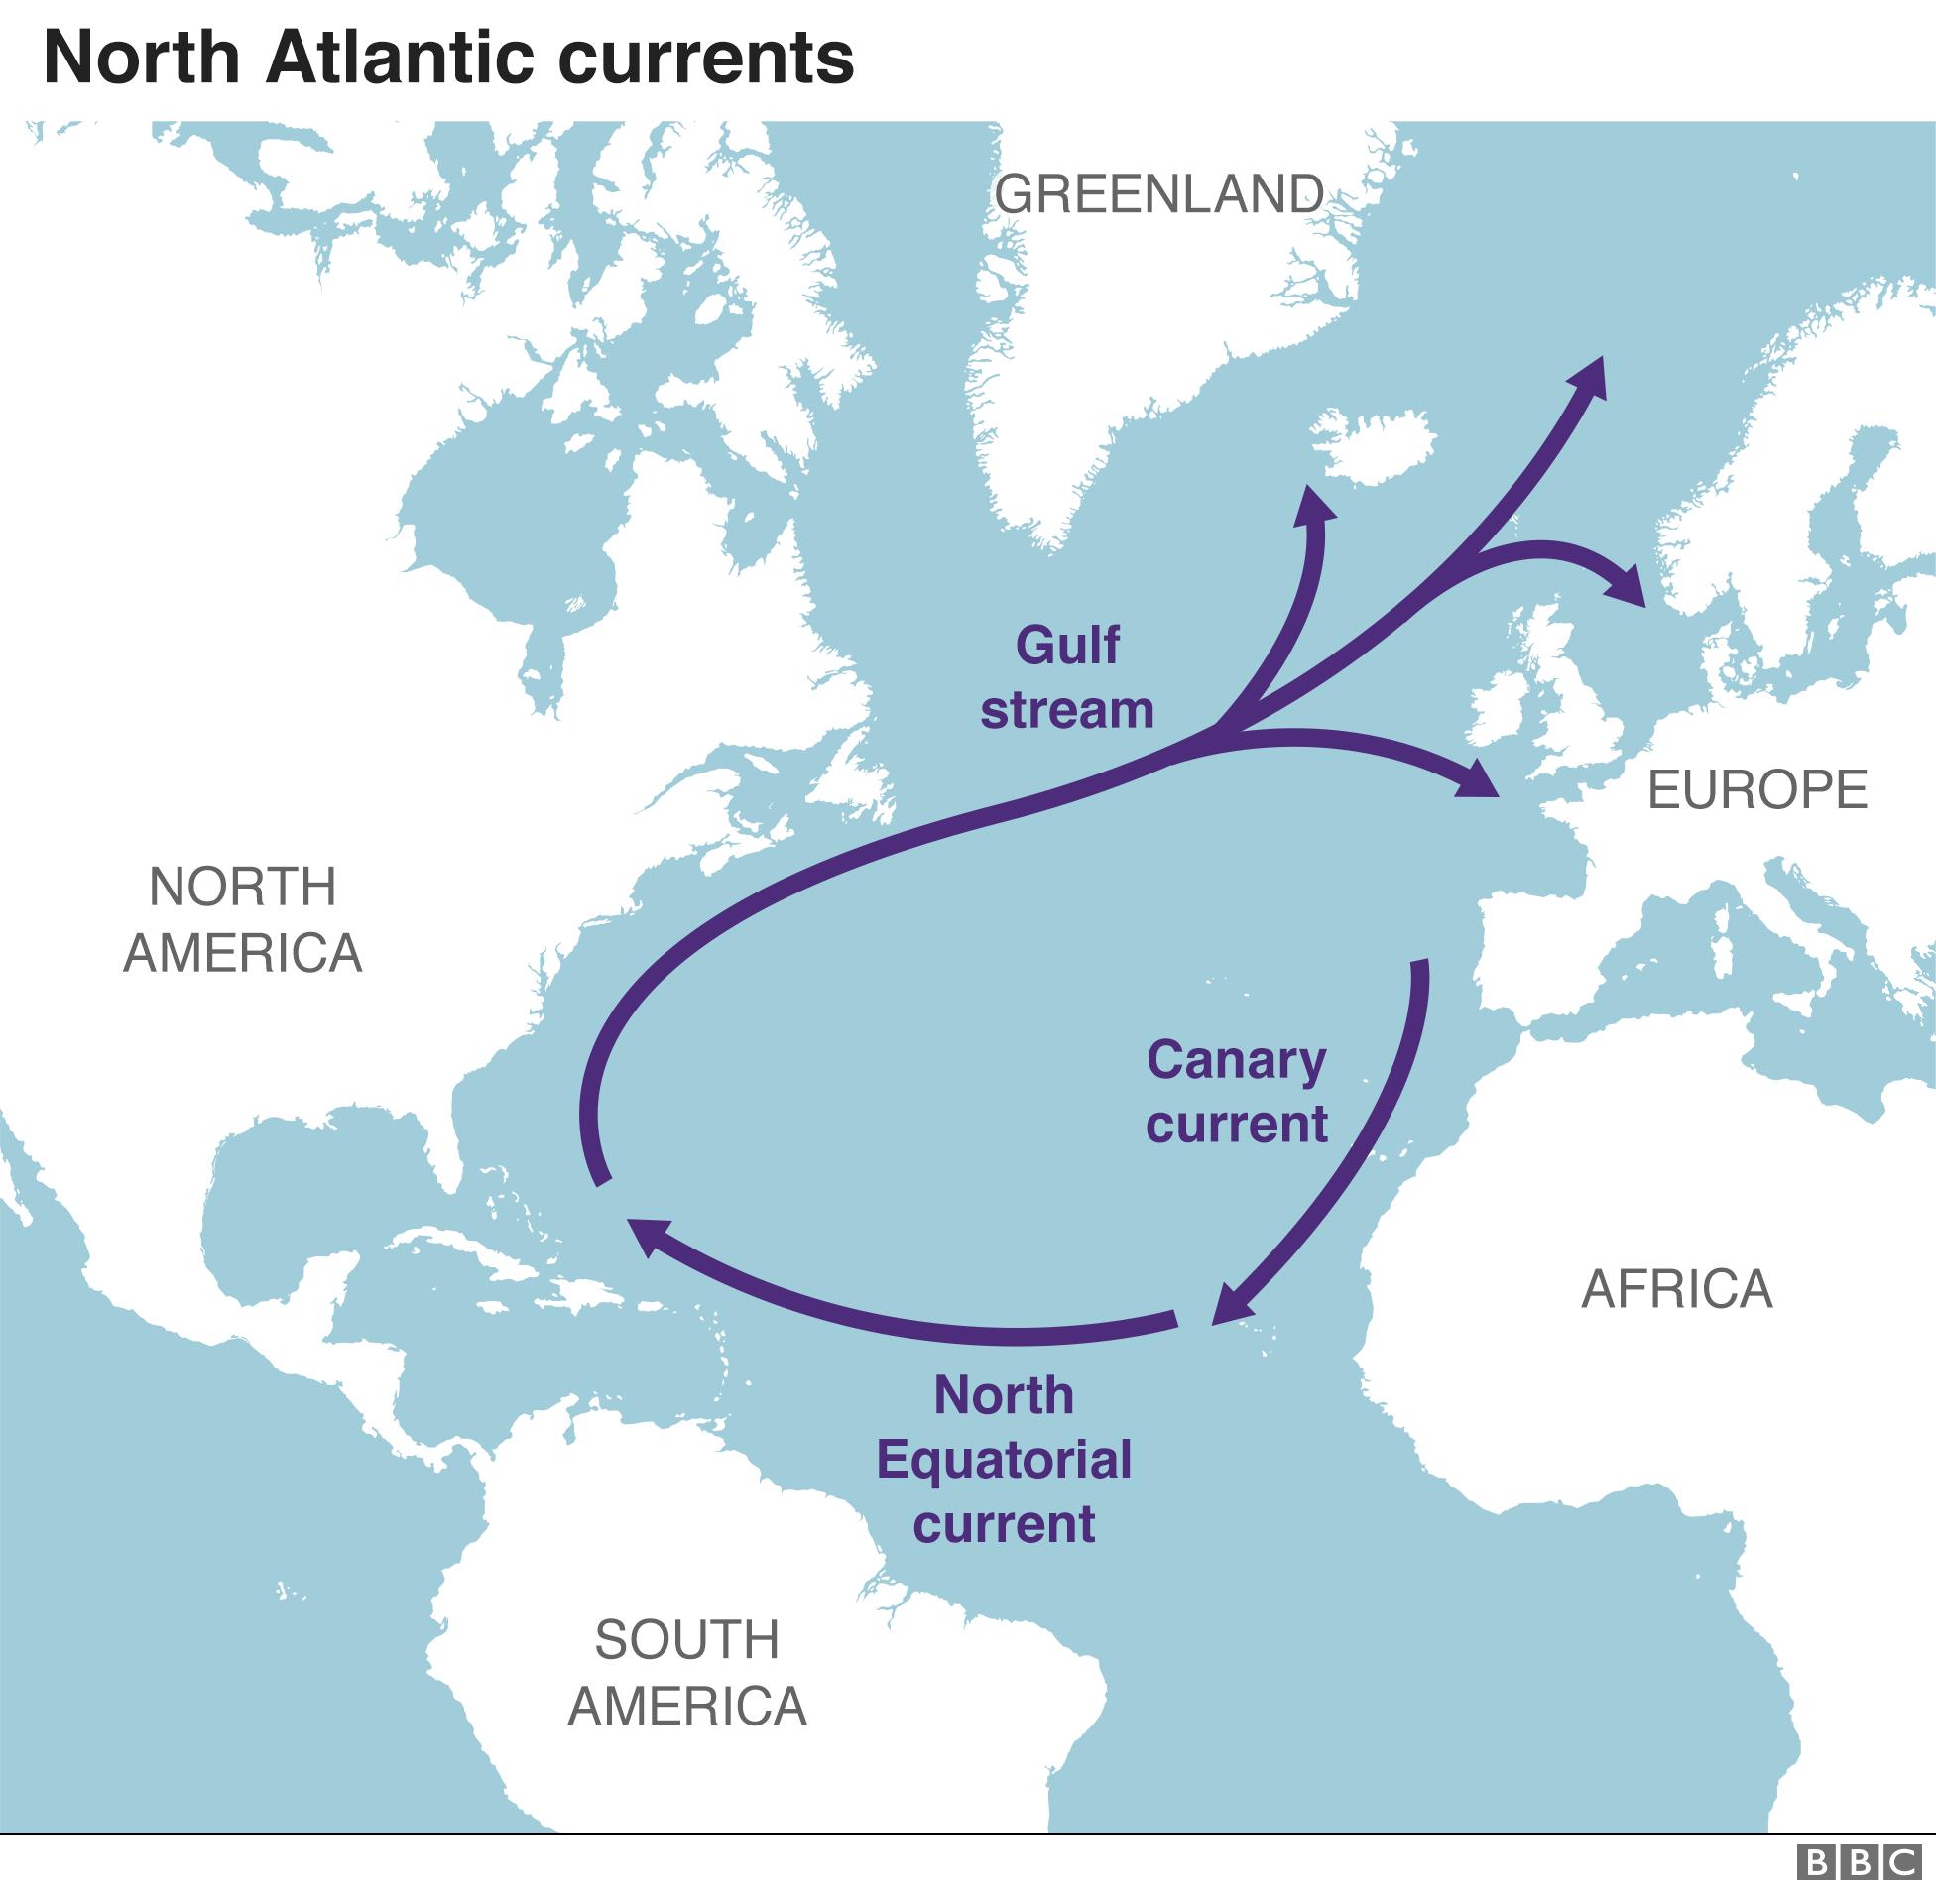 Map of North Atlantic currents